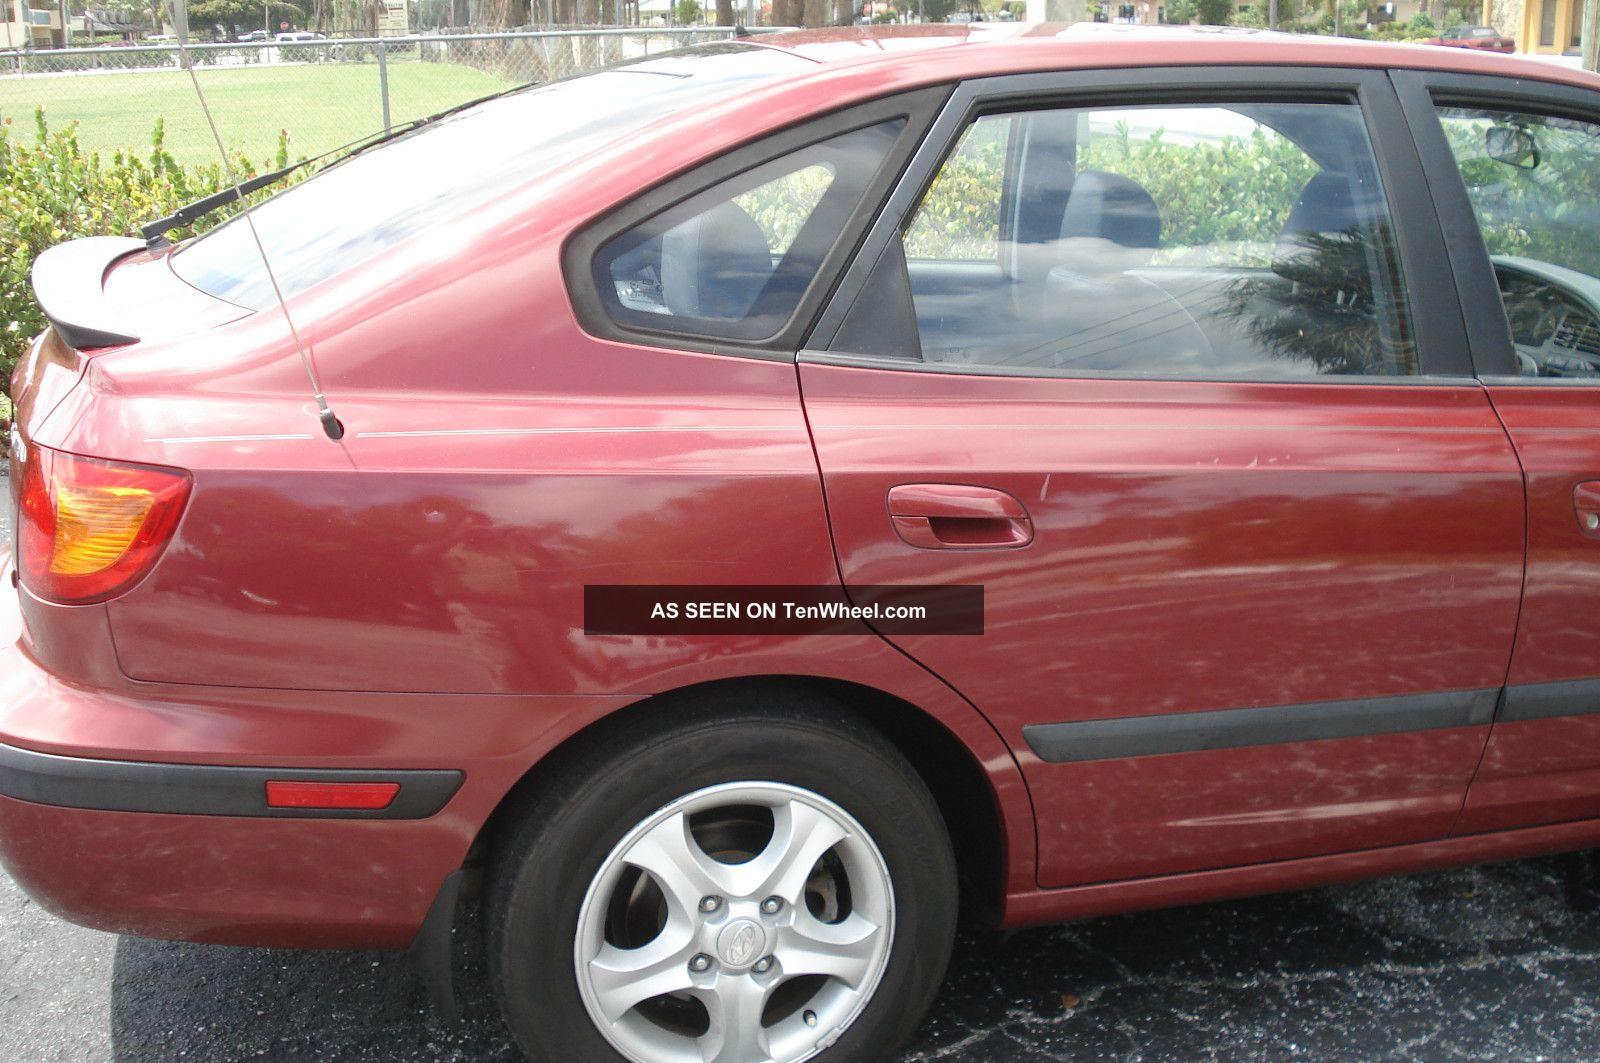 2002 hyundai elantra gt hatchback 5 door 2 0l interior tenwheel